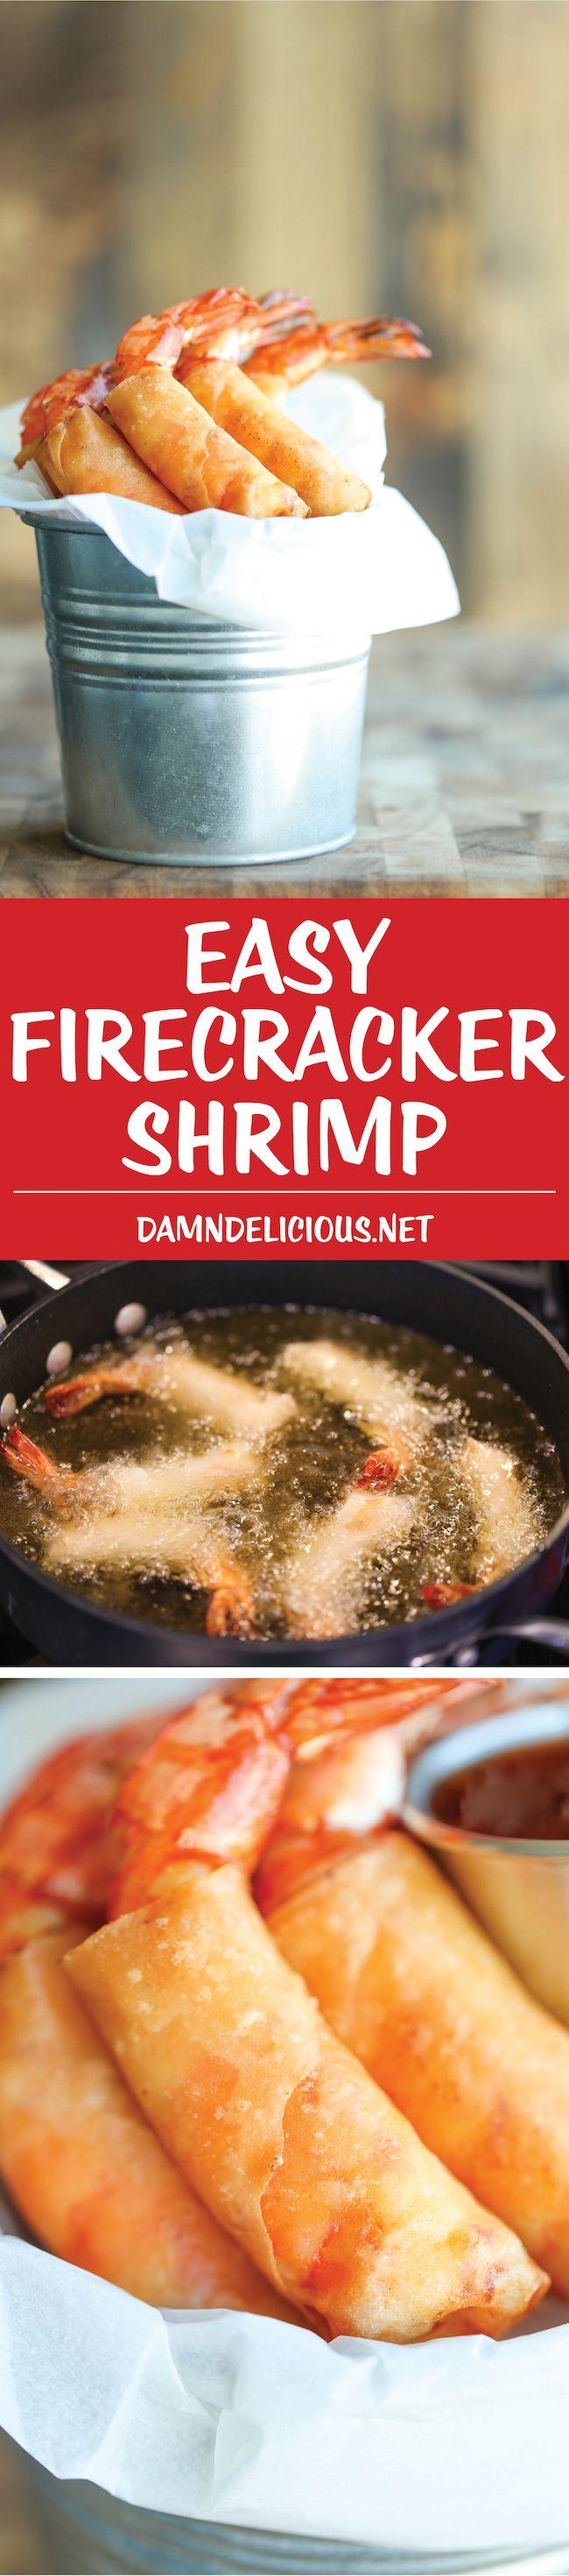 Game maker color blend - Easy Firecracker Shrimp